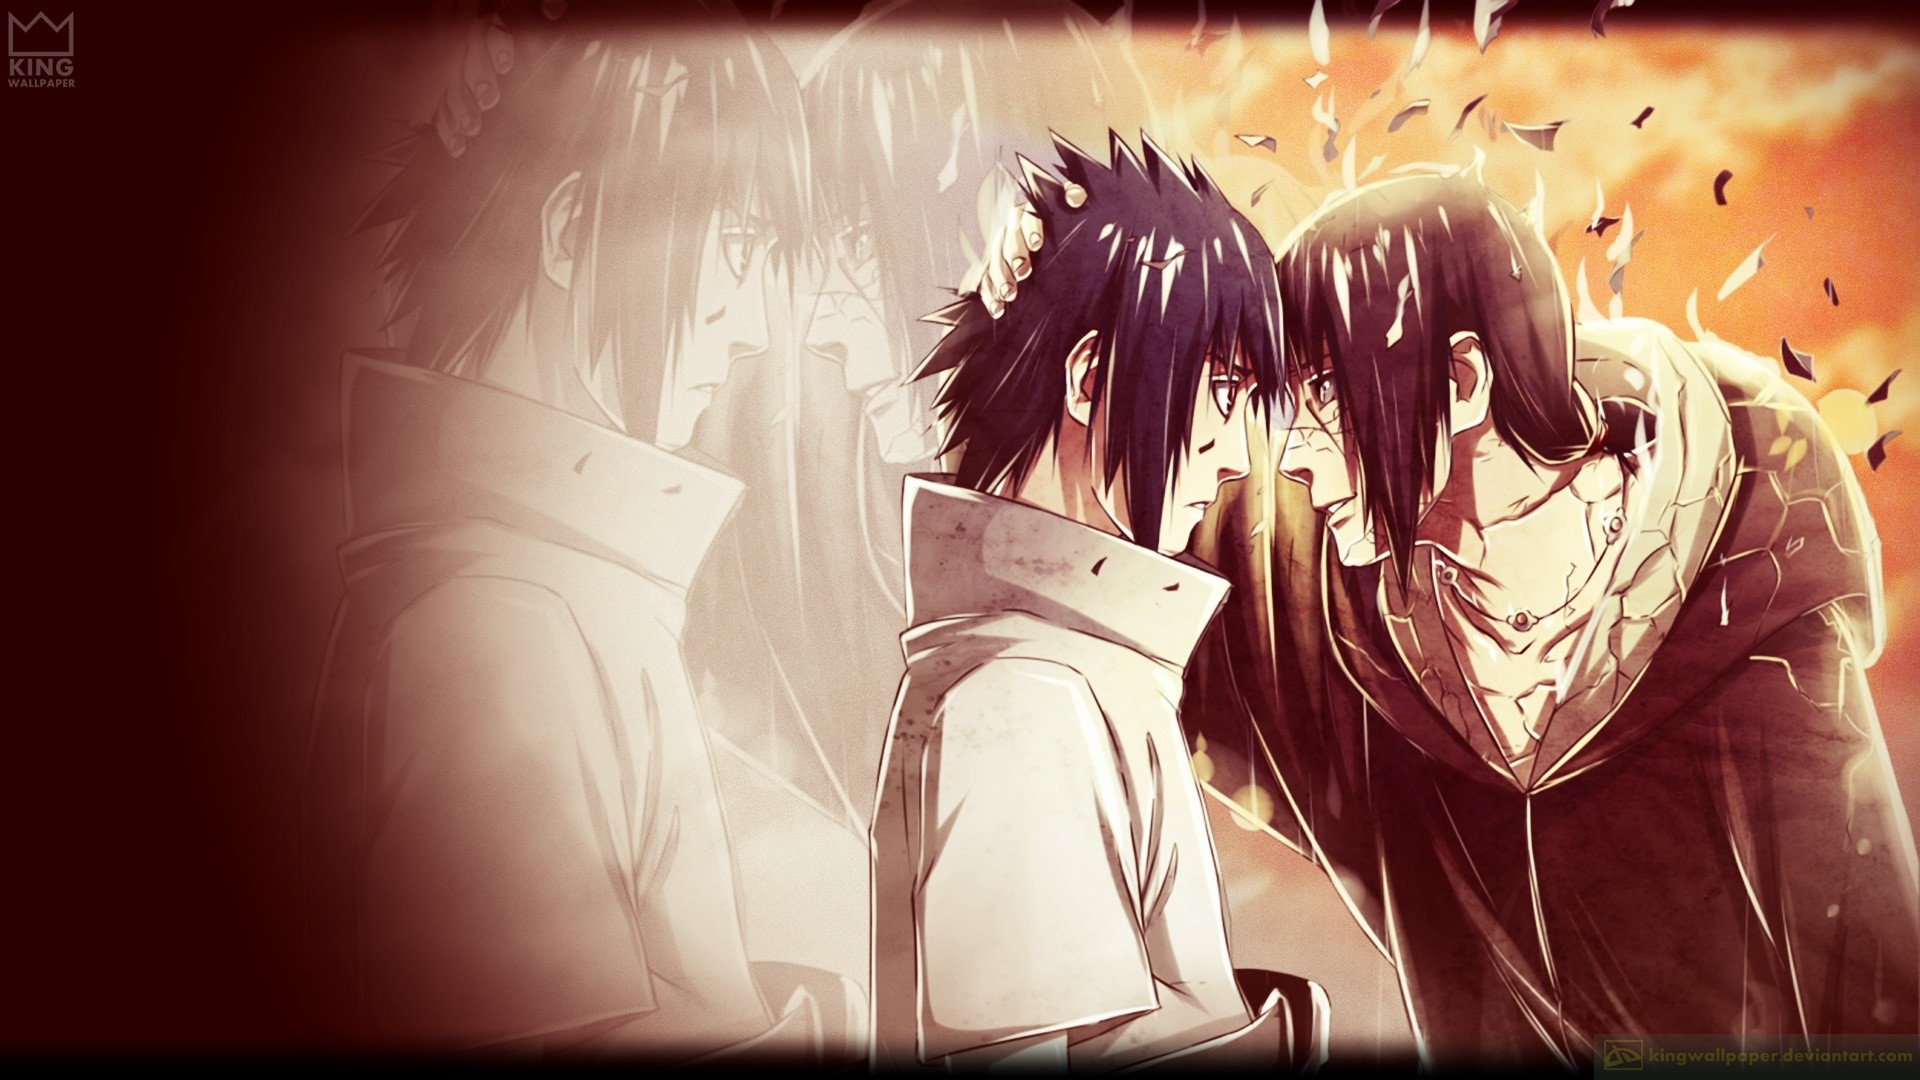 Sasuke and Itachi Wallpaper HD (62+ images)